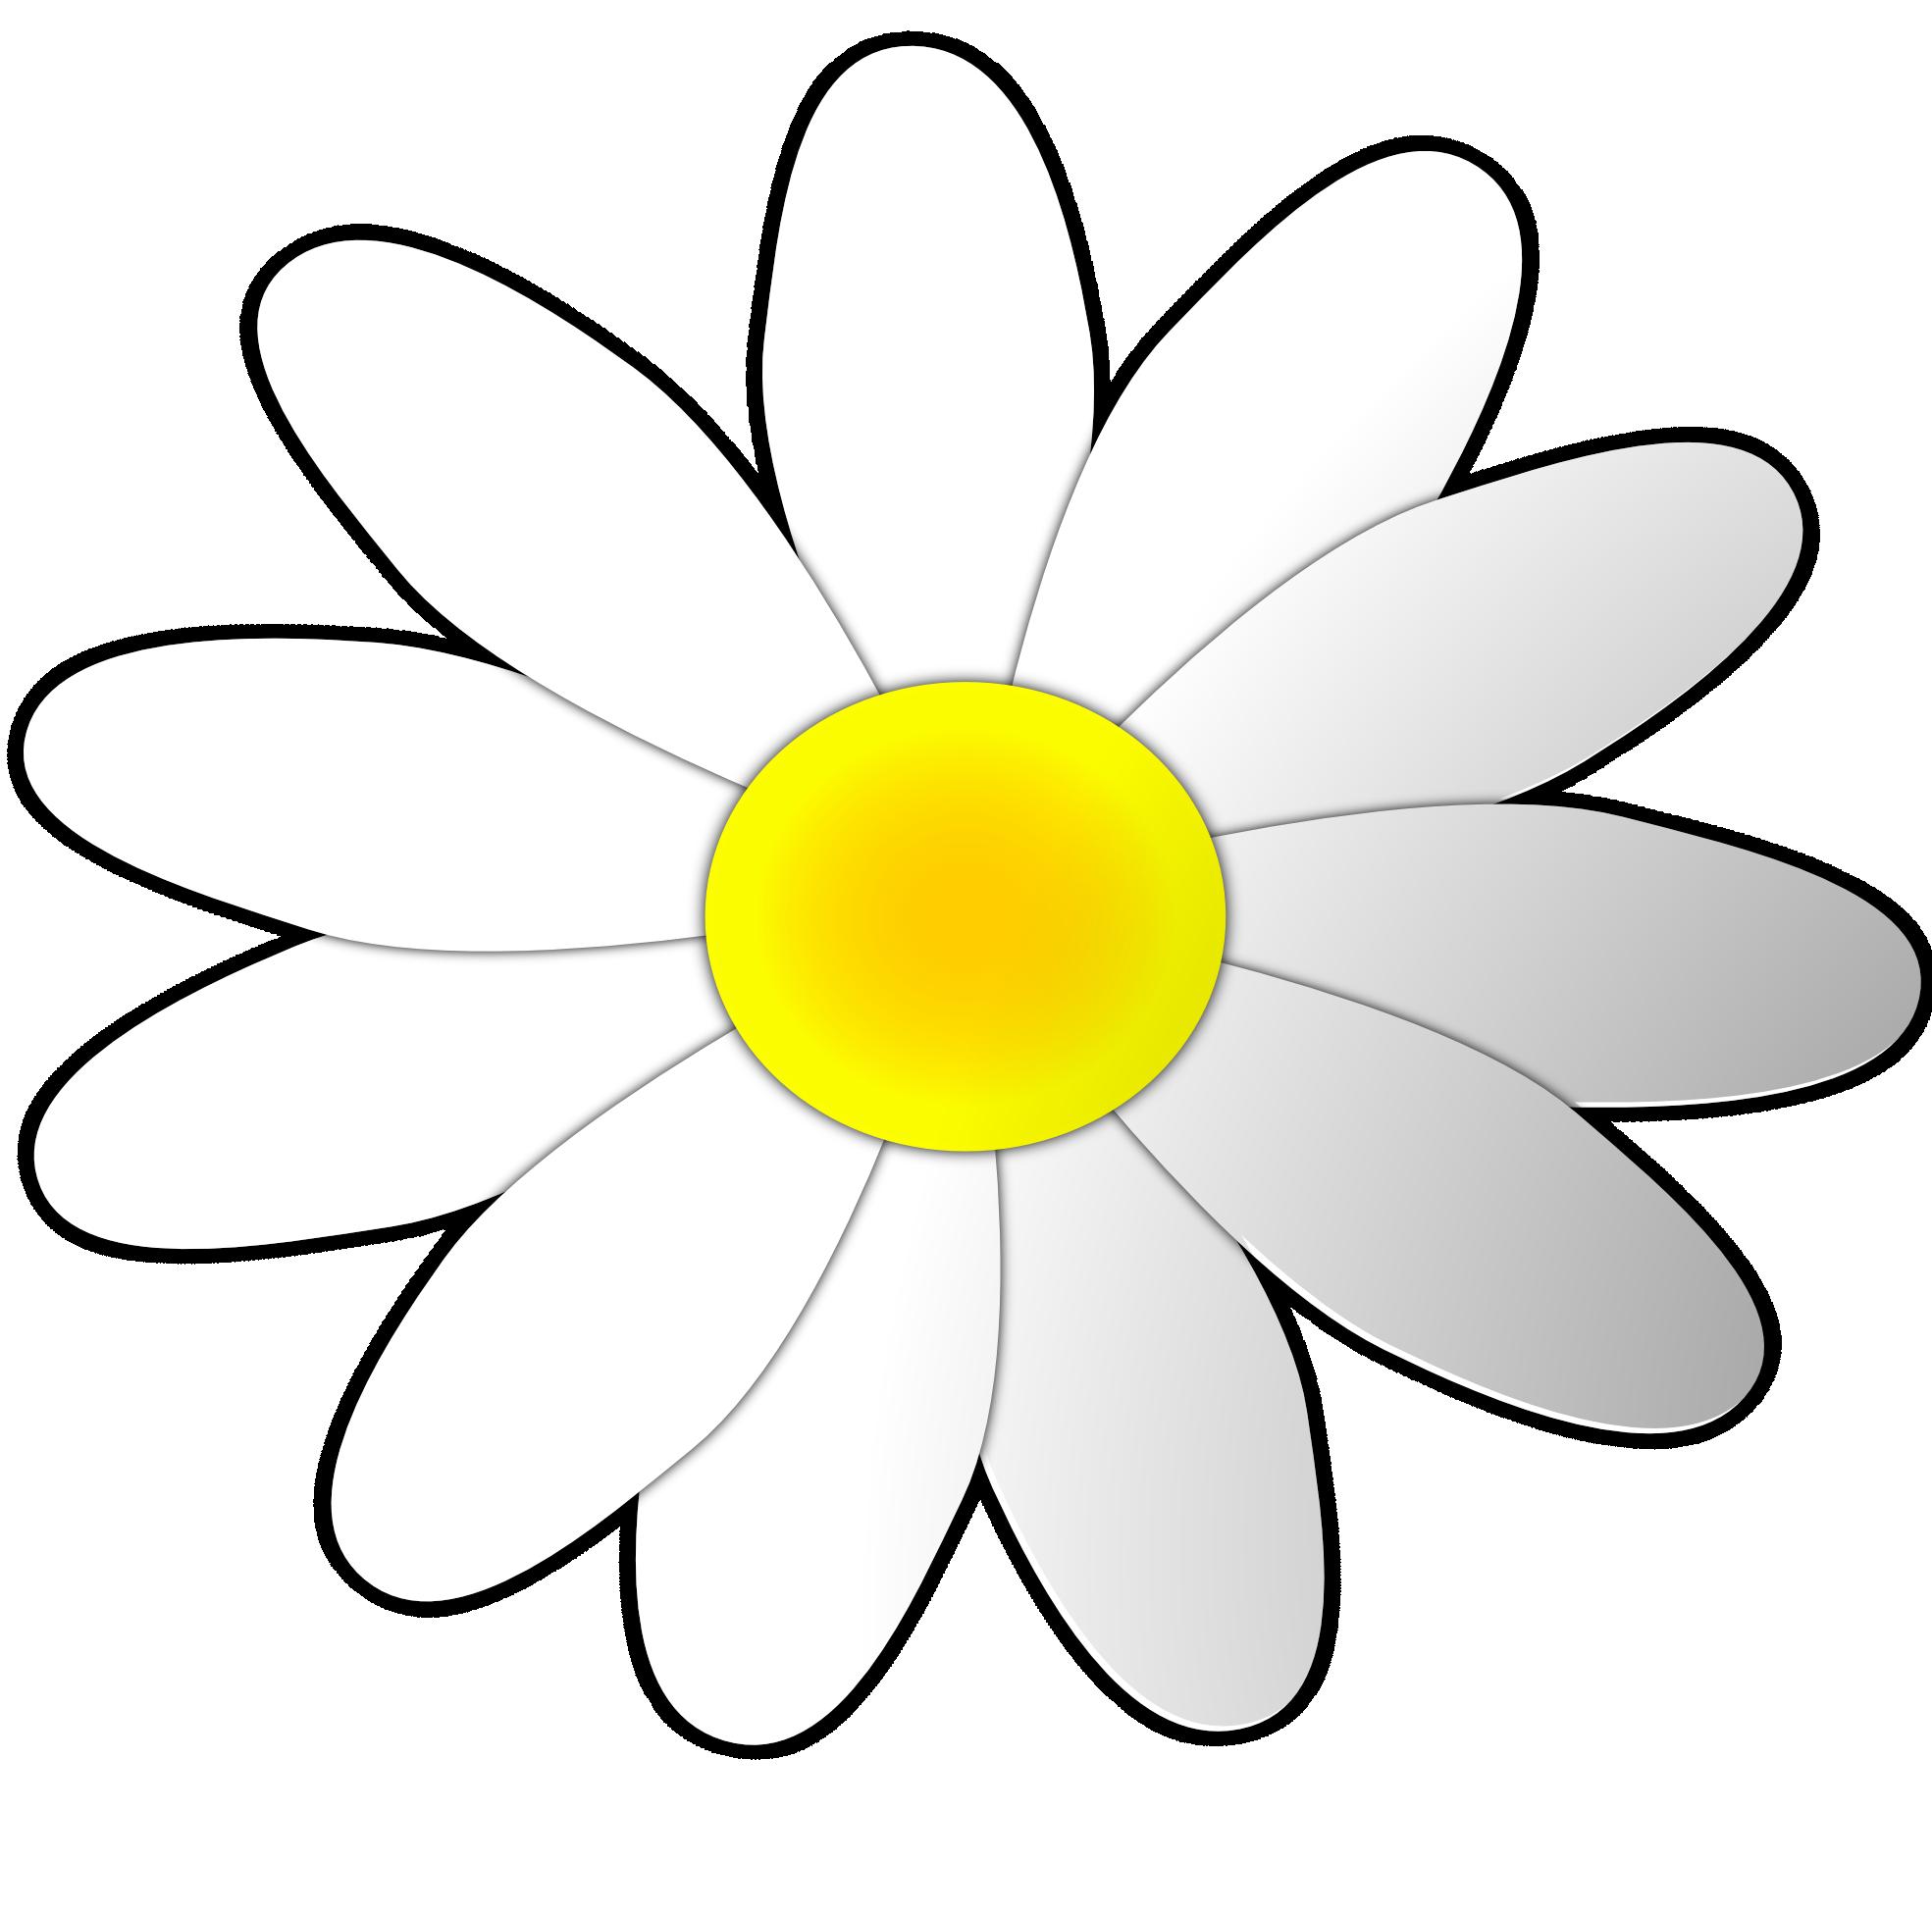 Daisy clipart small daisy. Cartoon flower best uwmsb